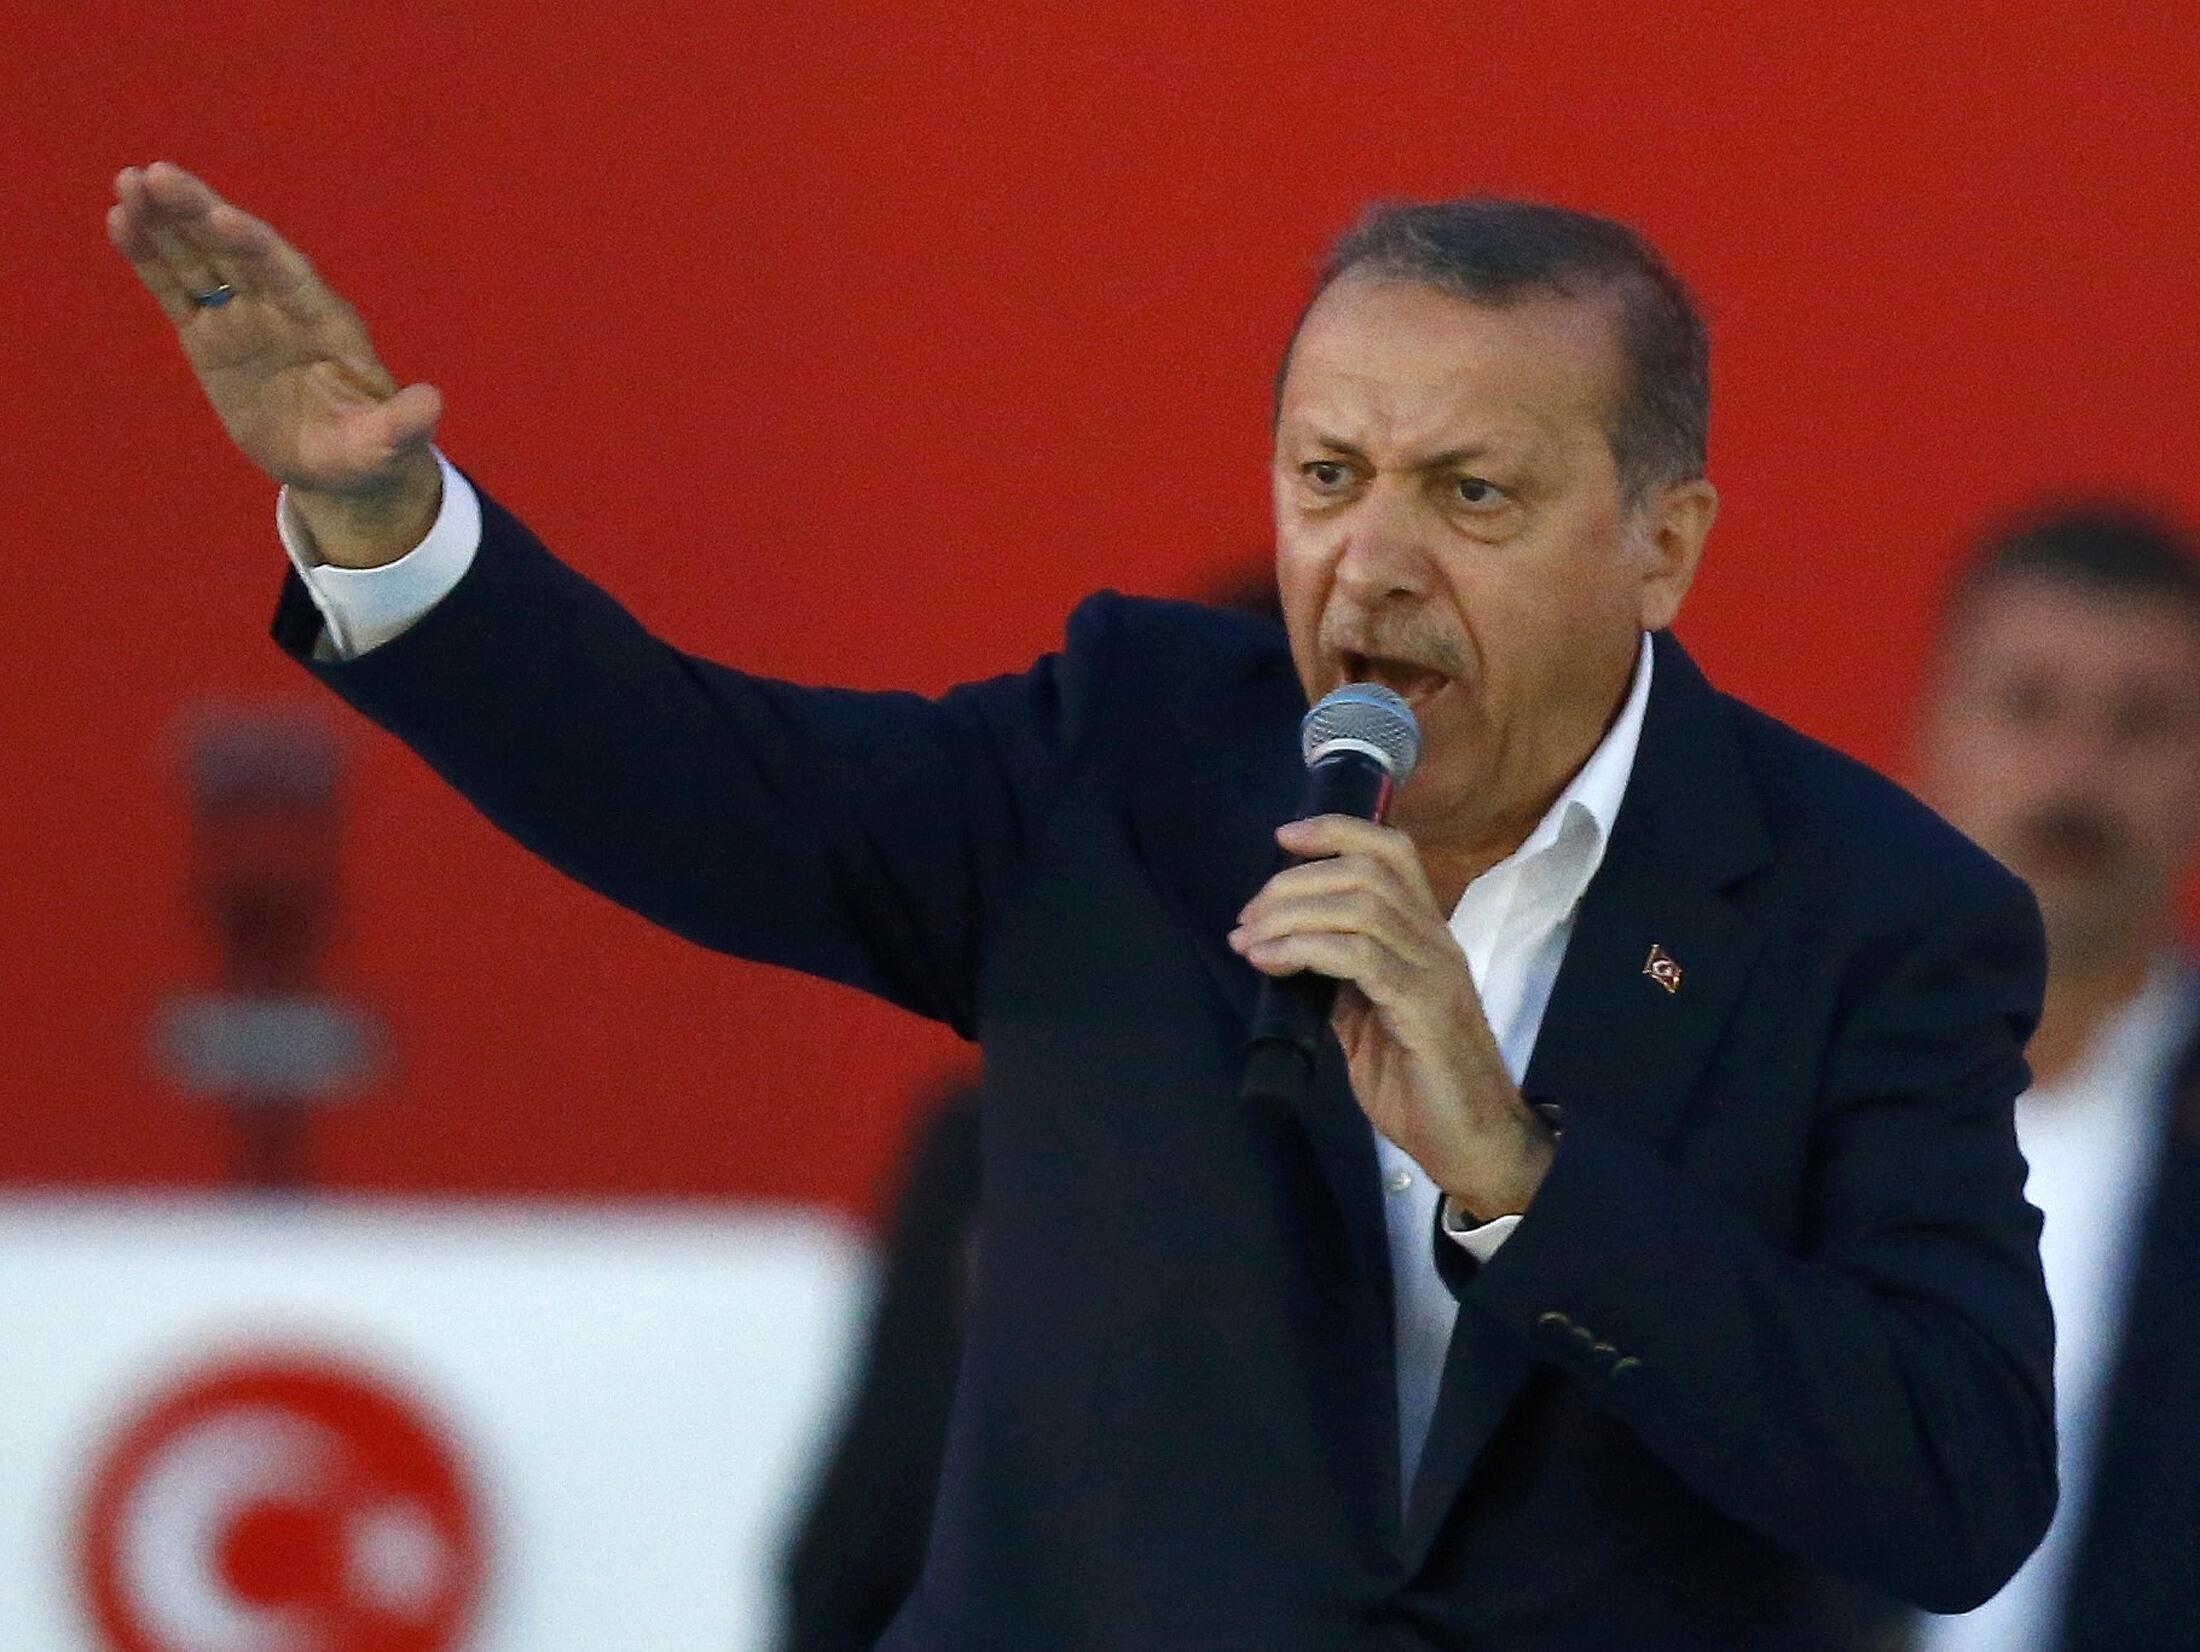 Turkish President Erdogan speaks during Democracy and Martyrs Rally in Istanbul, Turkey, August 7, 2016.